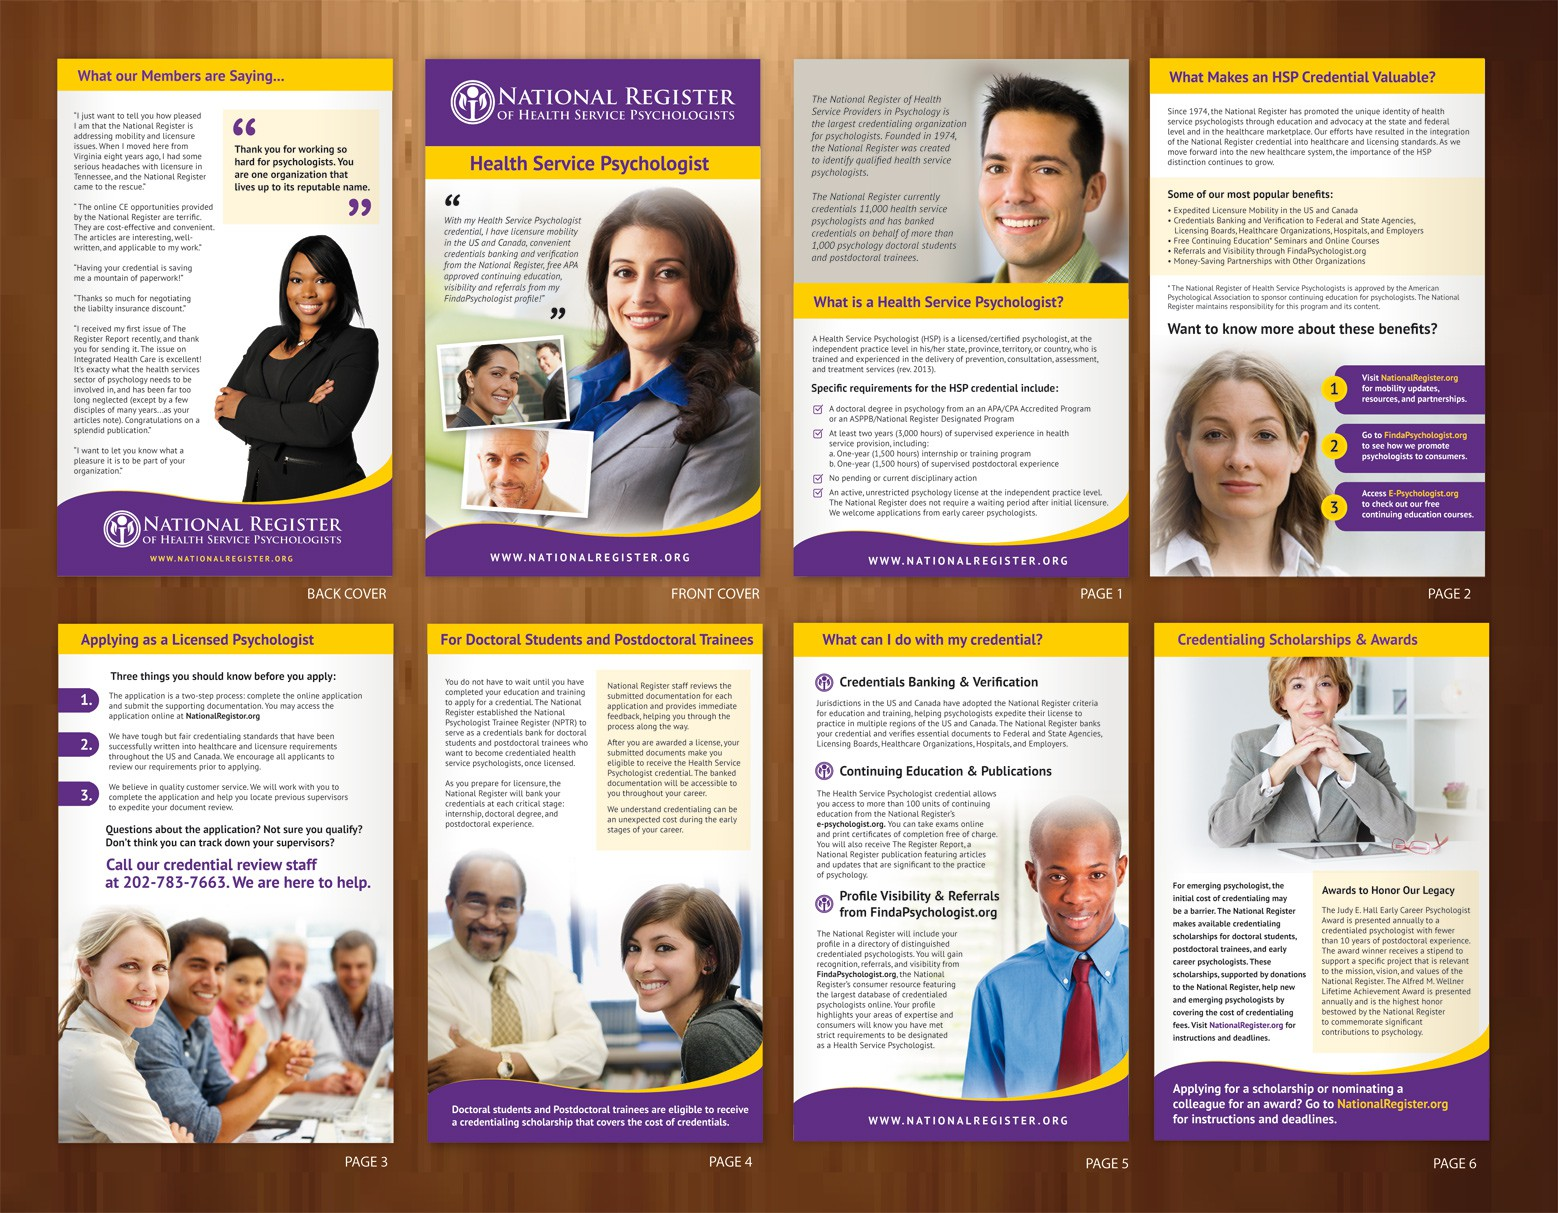 National Register of Health Service Psychologist needs a new brochure design